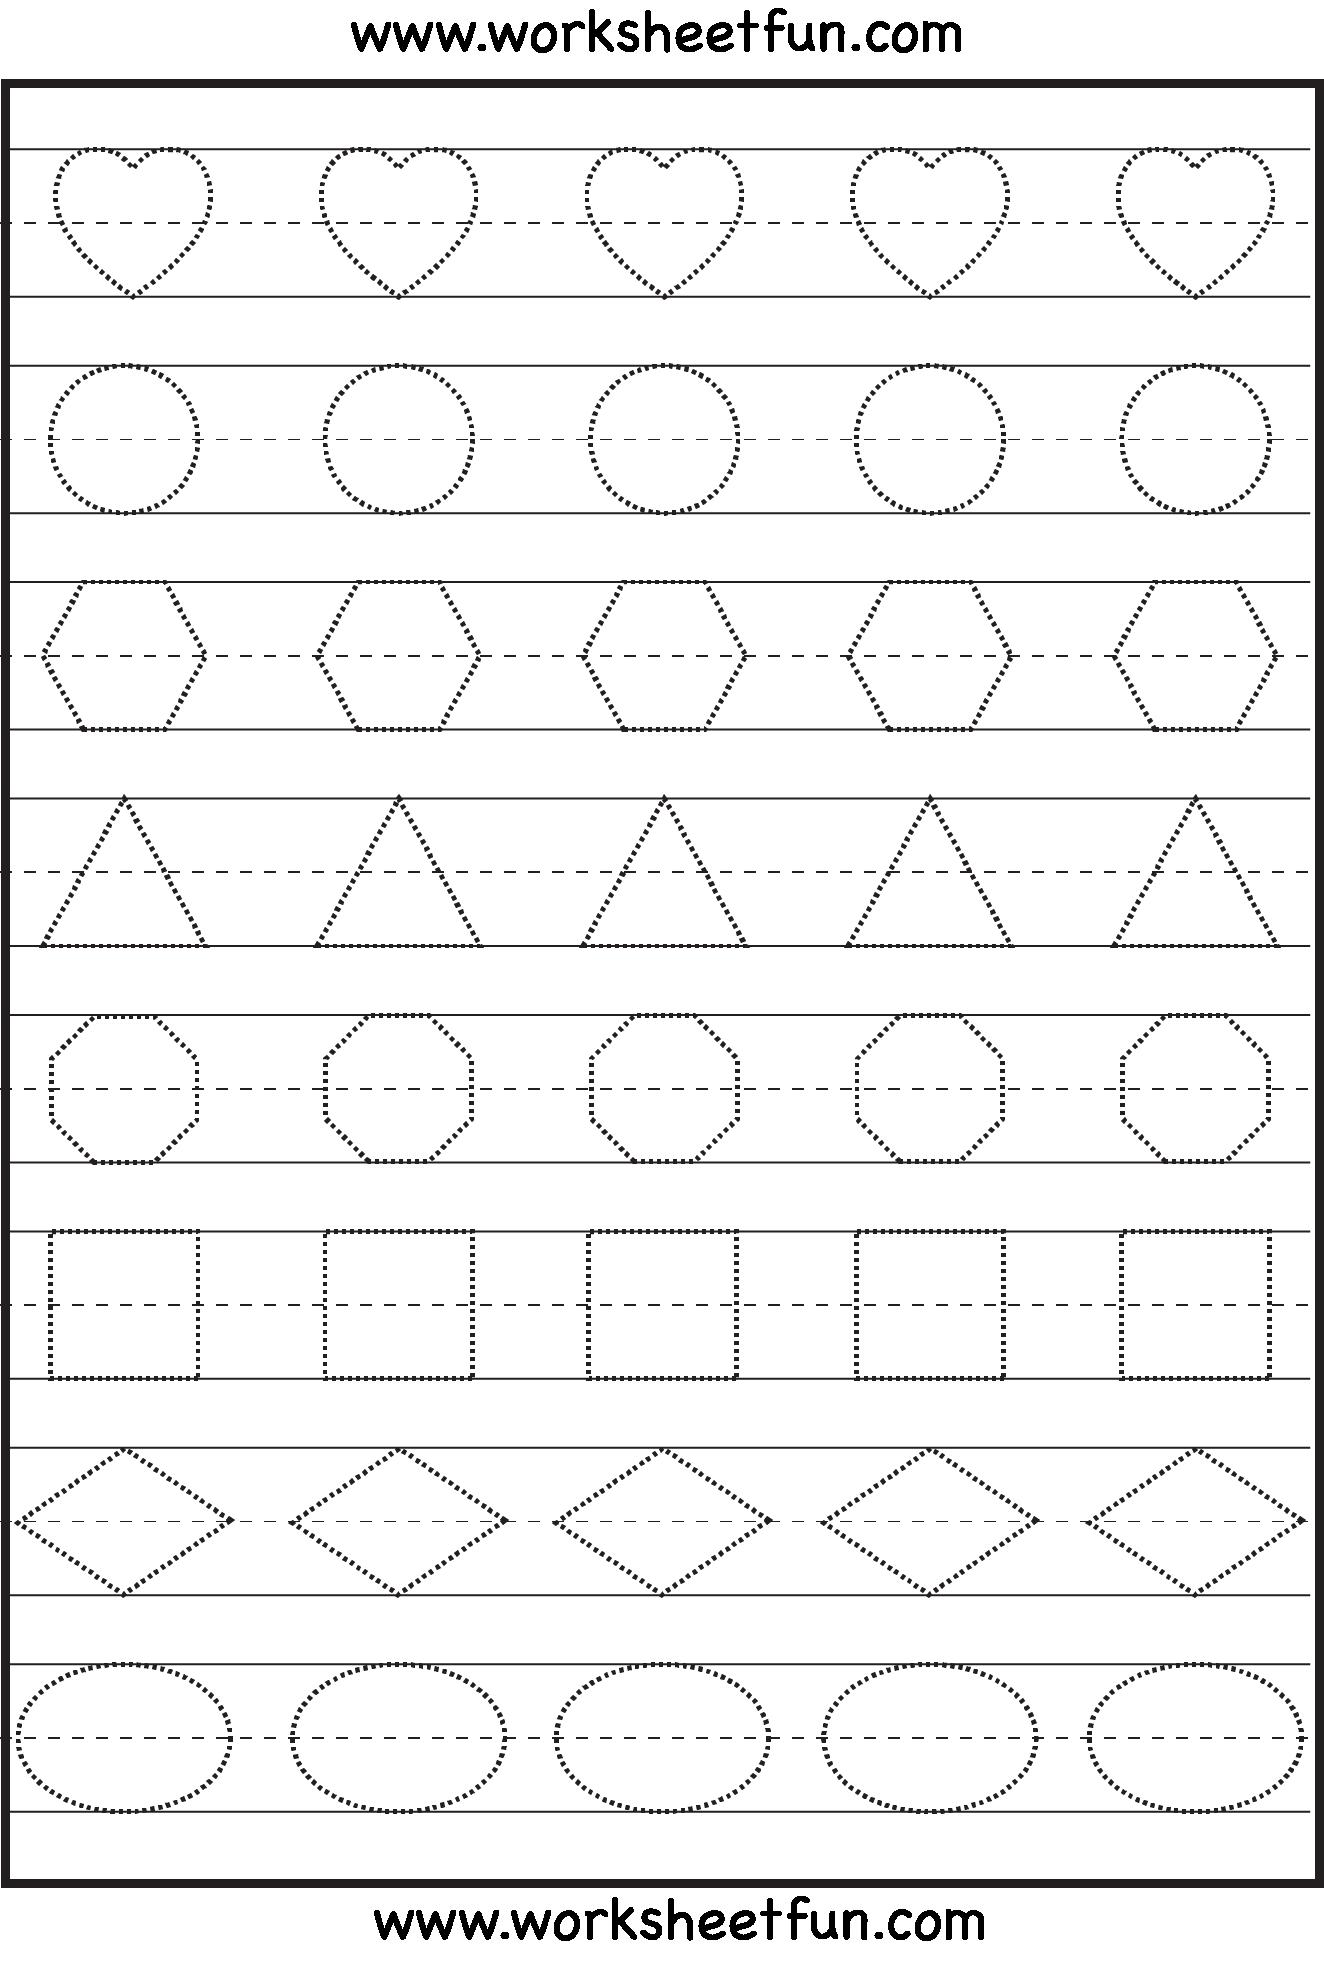 Worksheets Preschool Worksheets Printables Free 6 best images of preschool toddler worksheets printable free shapes